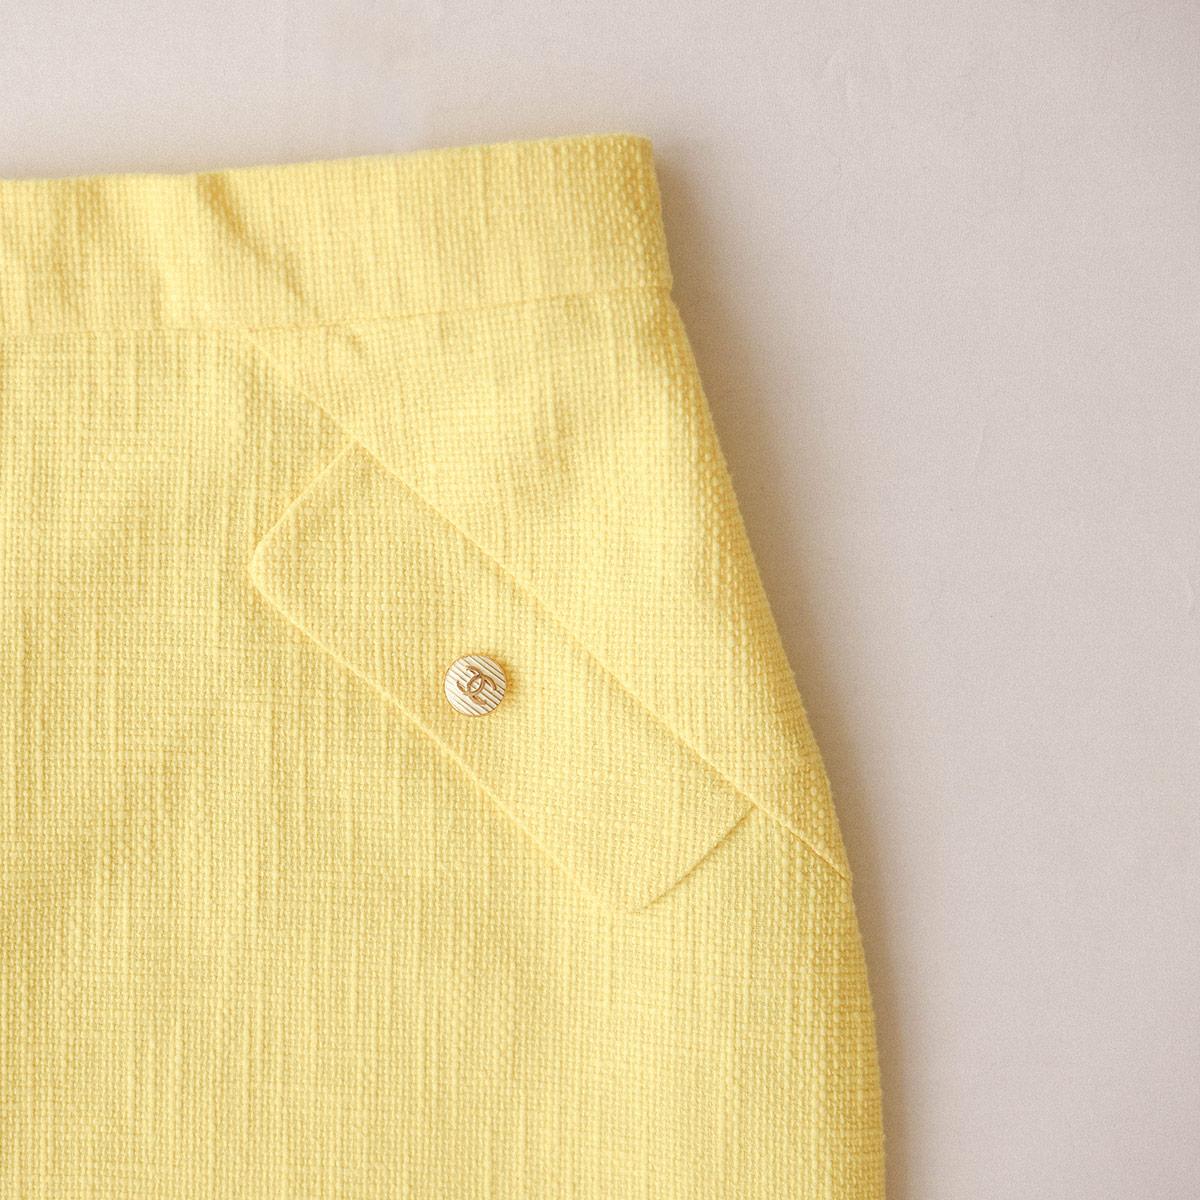 chanel-inspired-skirt-burda-thepetitecat-6